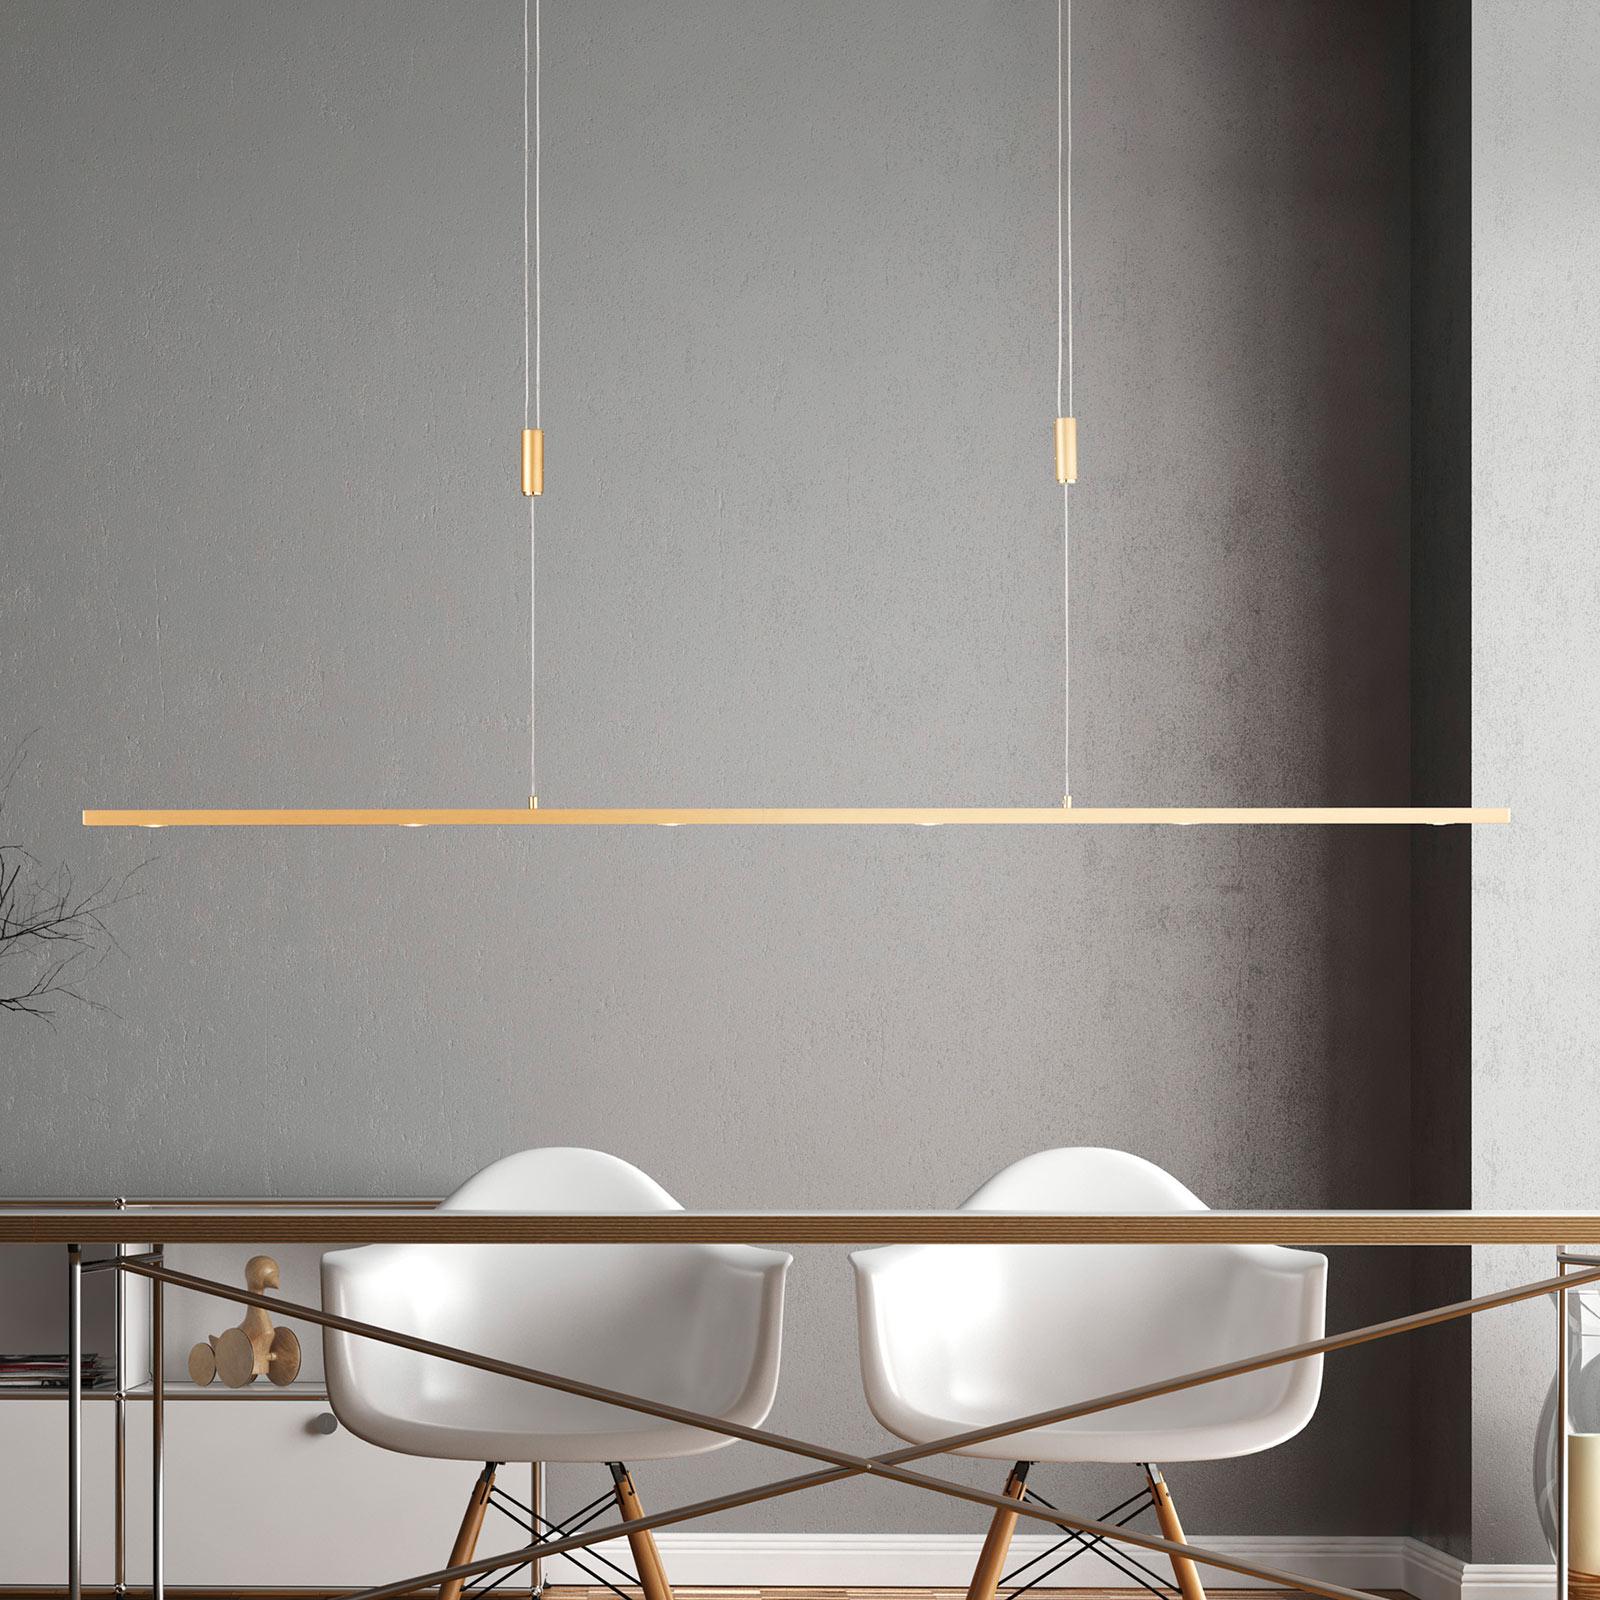 Lucande Tolu LED-riippuvalaisin, messinki, 139 cm